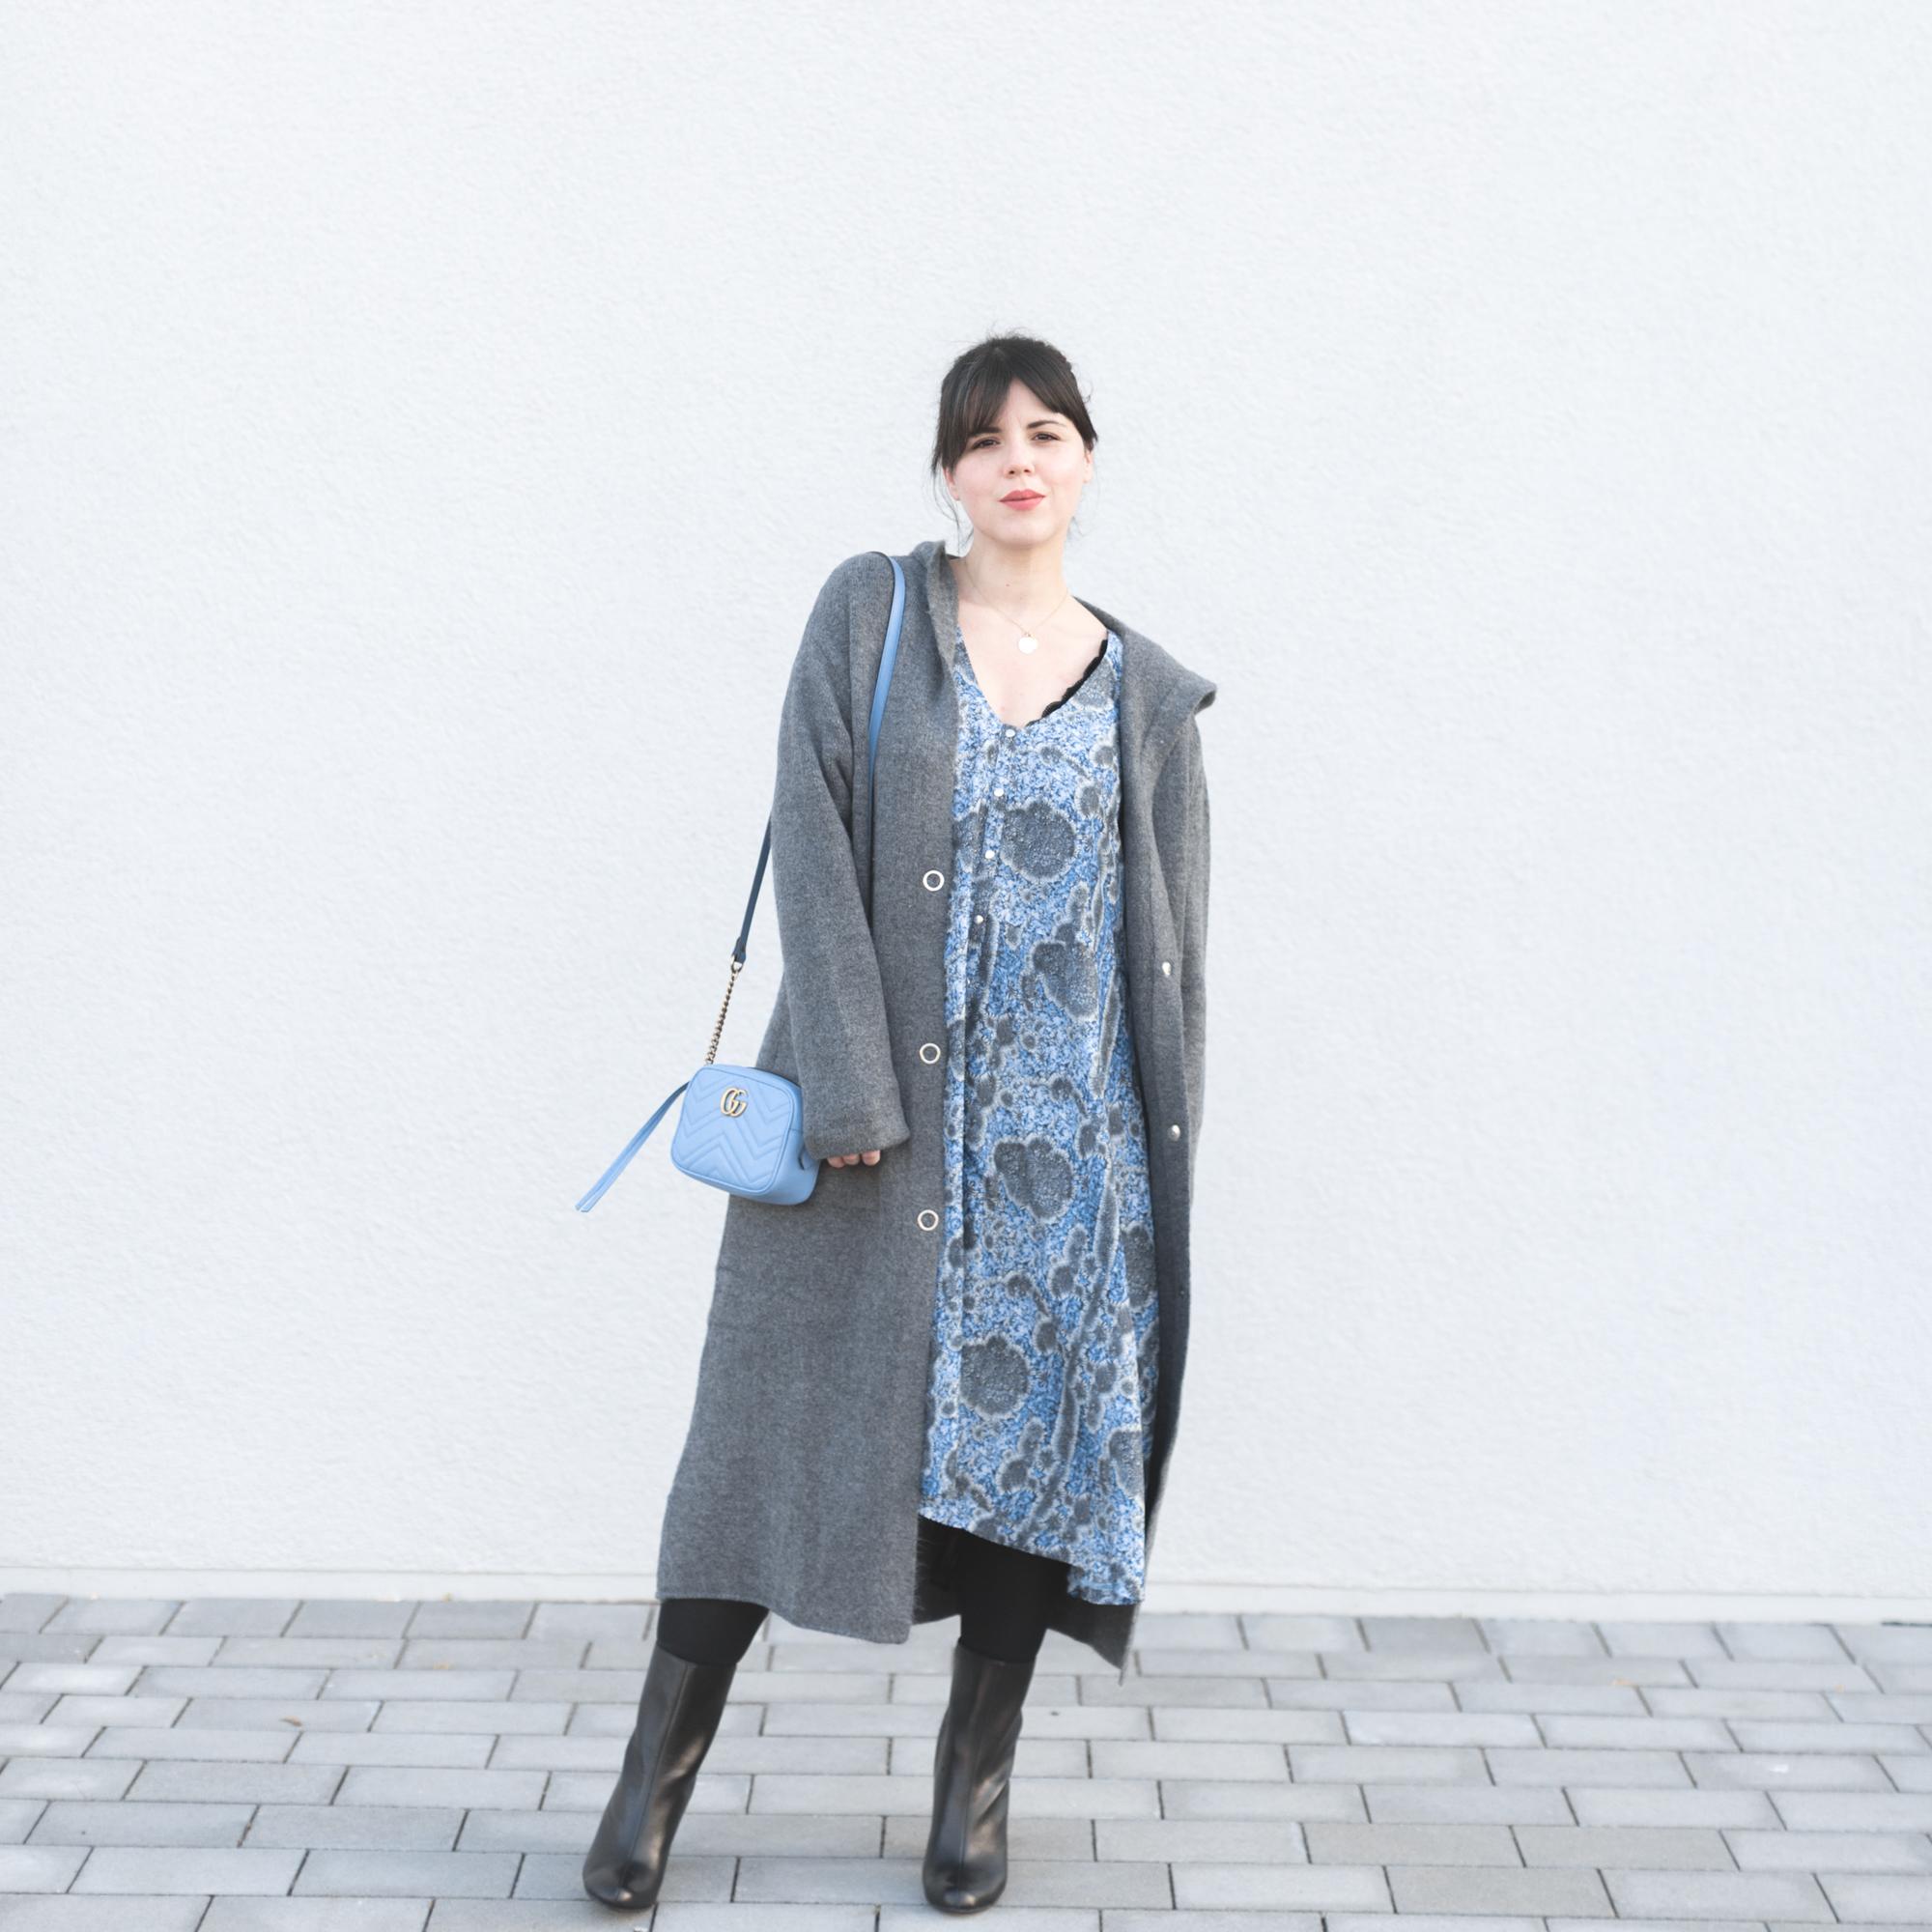 2000_heimstone_java_robe_dress_gucci_marmont_blue_copyright_paulinefashionblog_com-3